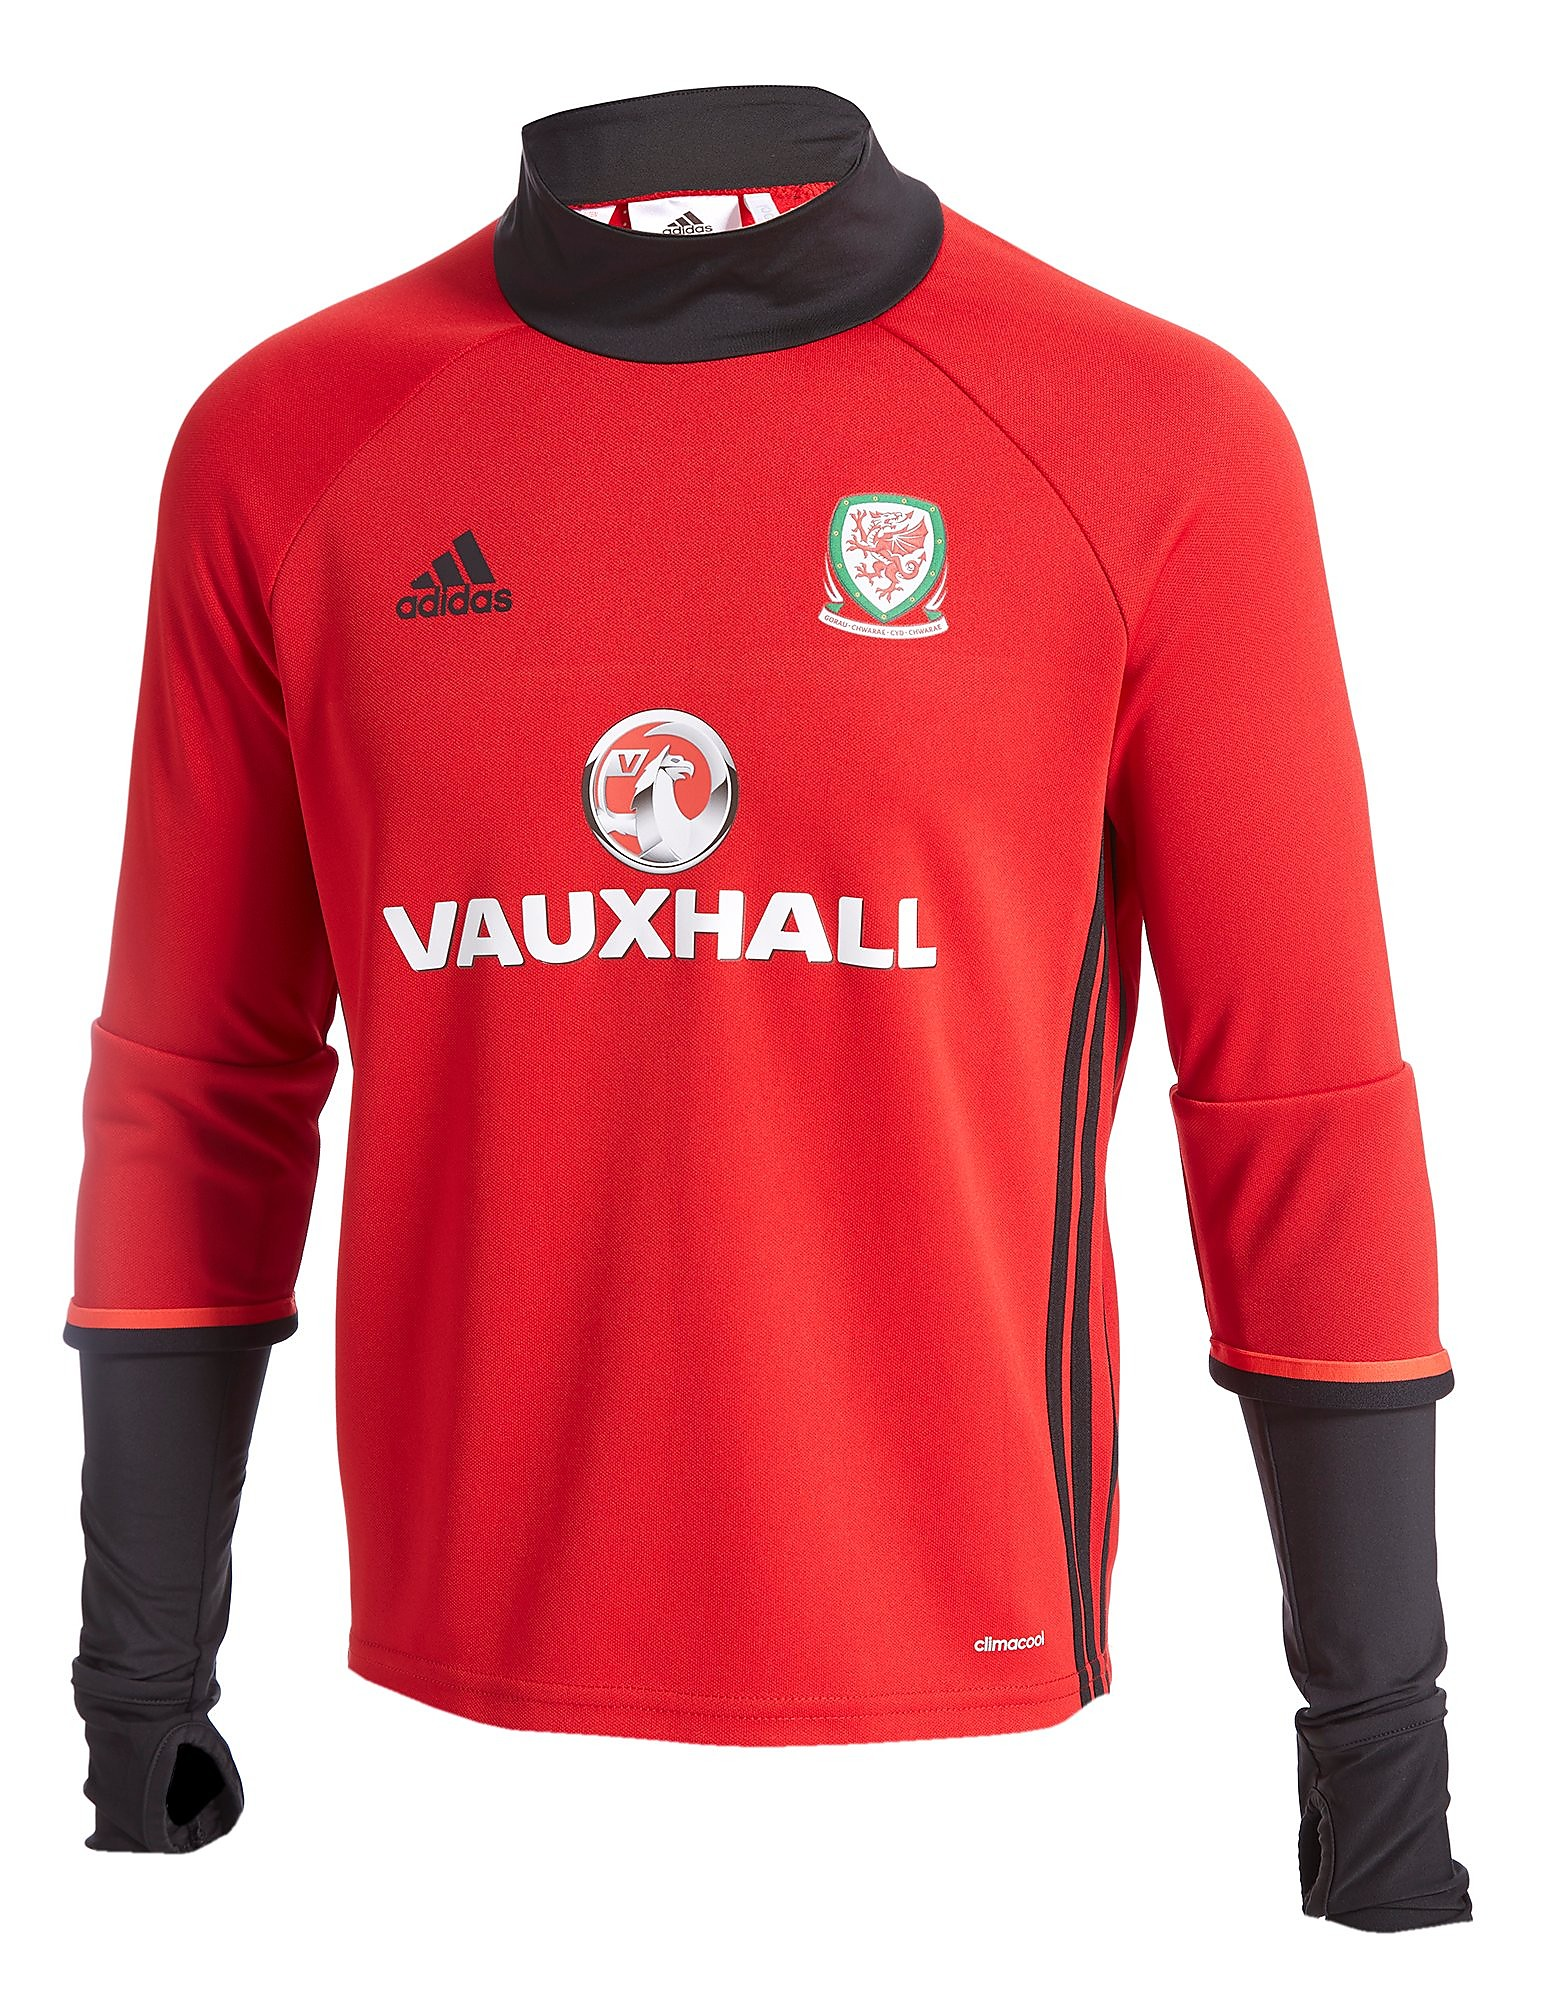 adidas Wales 2016/17 Training Top Junior